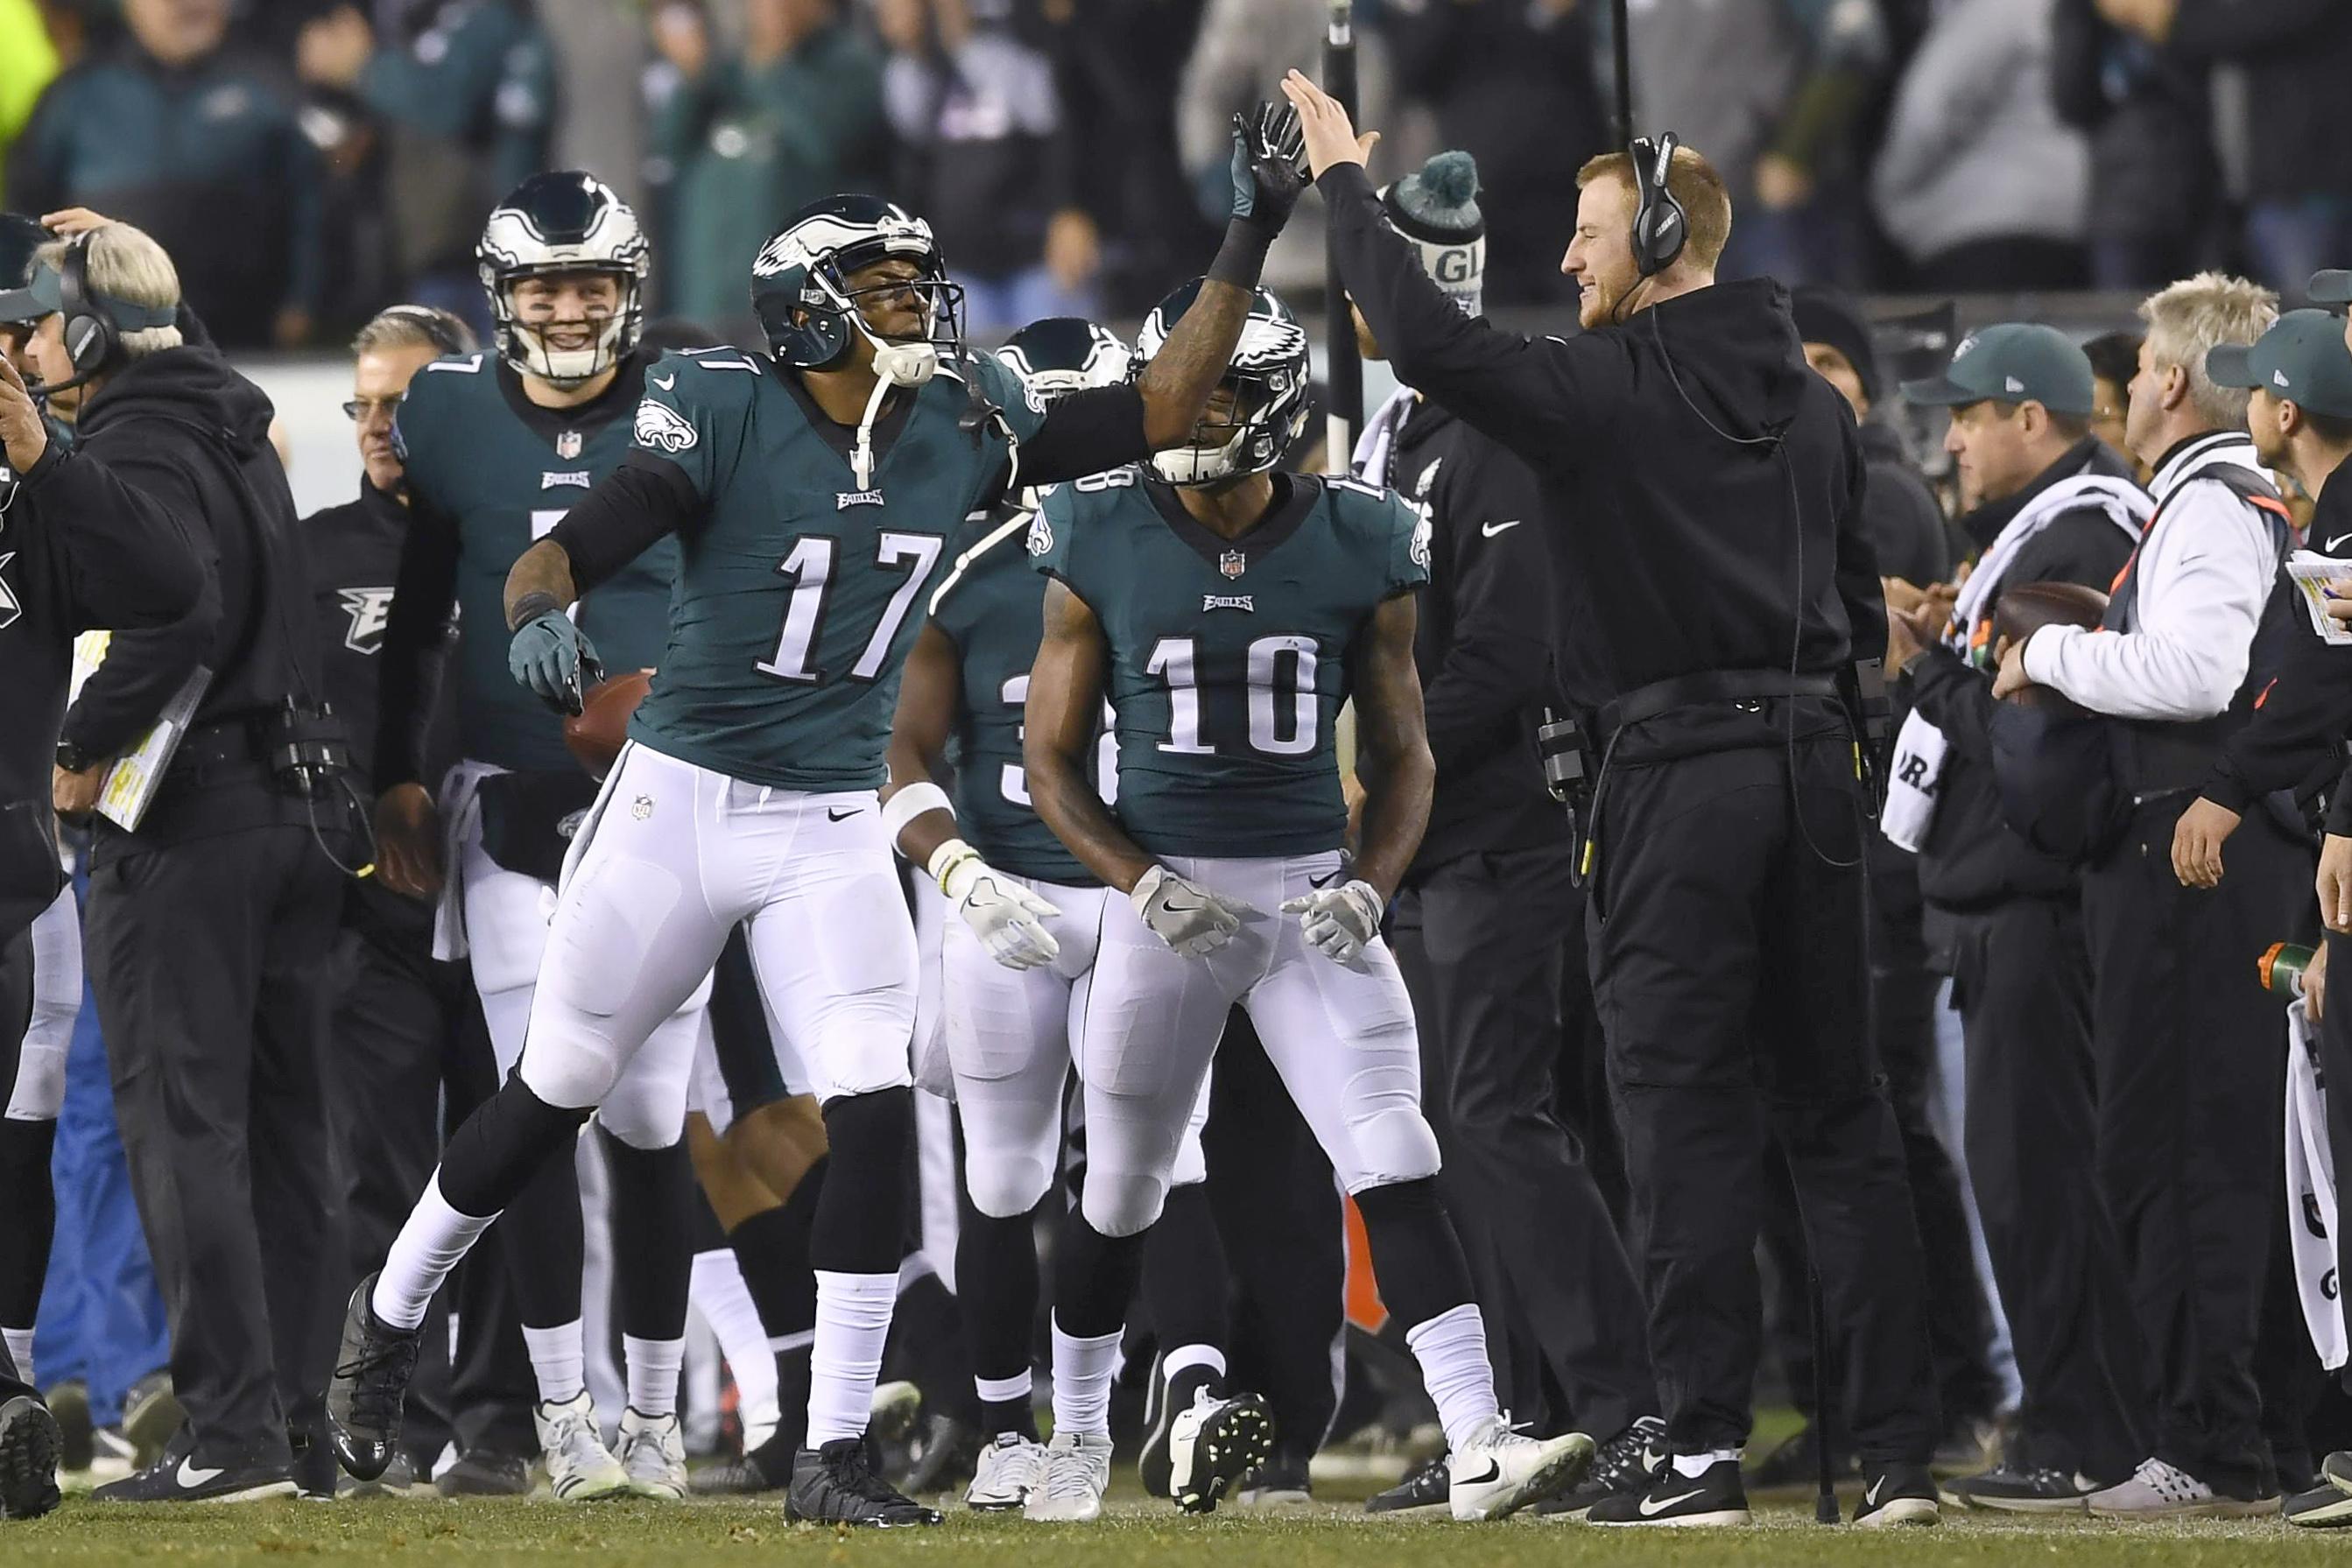 NFL: JAN 21 NFC Championship Game - Vikings at Eagles